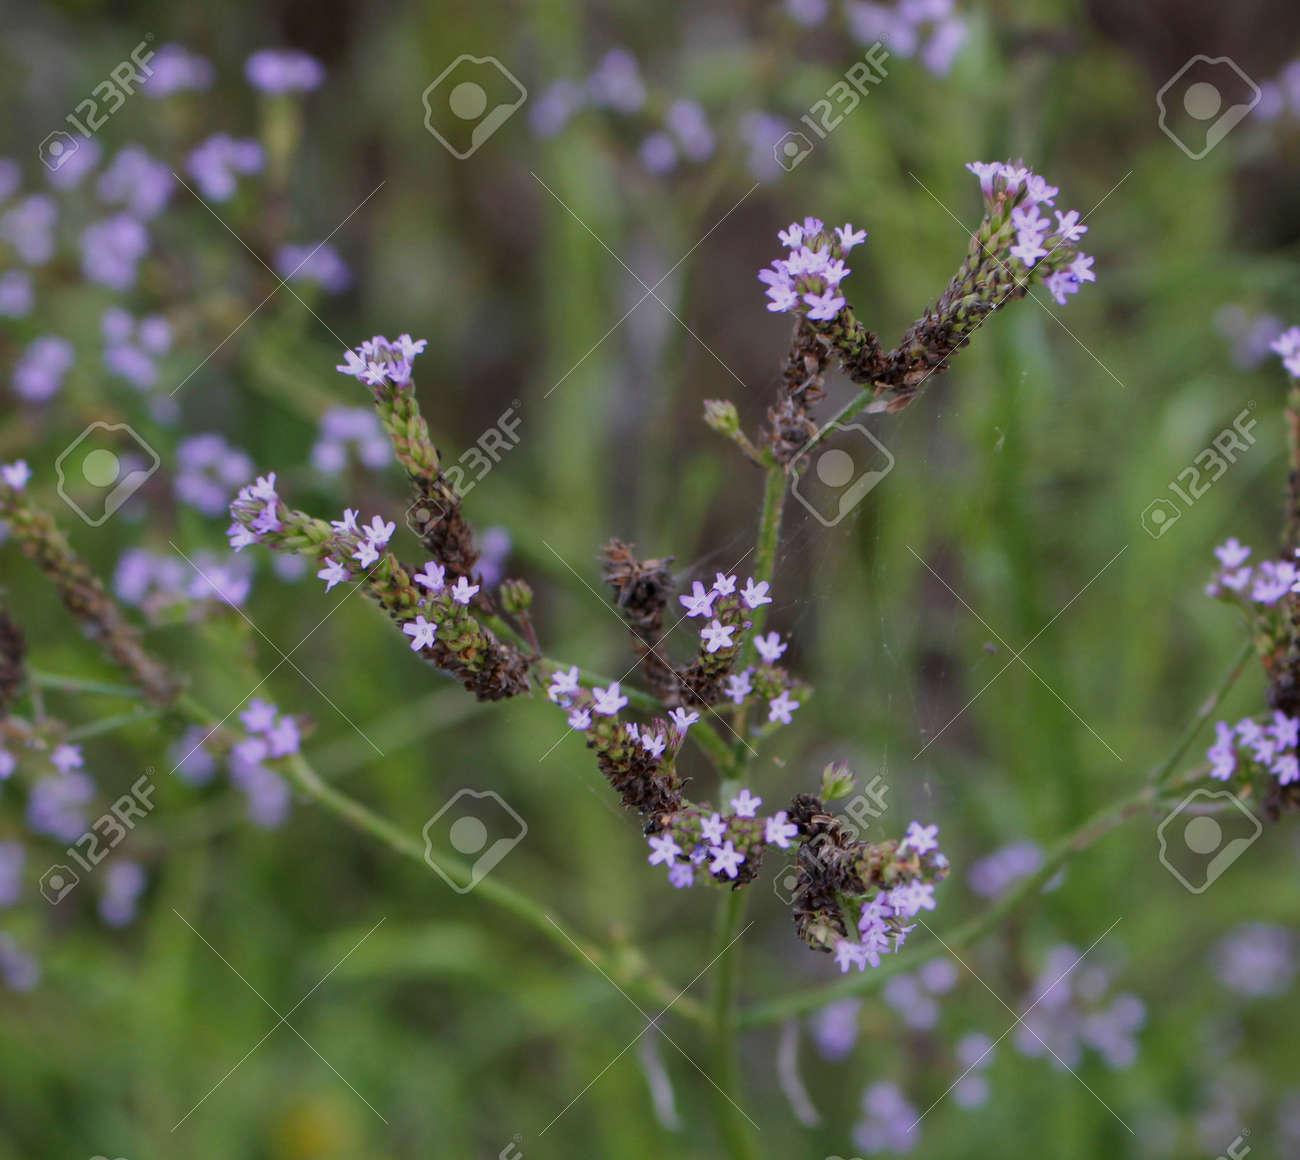 Purple perennial flowers stock photo picture and royalty free image purple perennial flowers stock photo 104089586 mightylinksfo